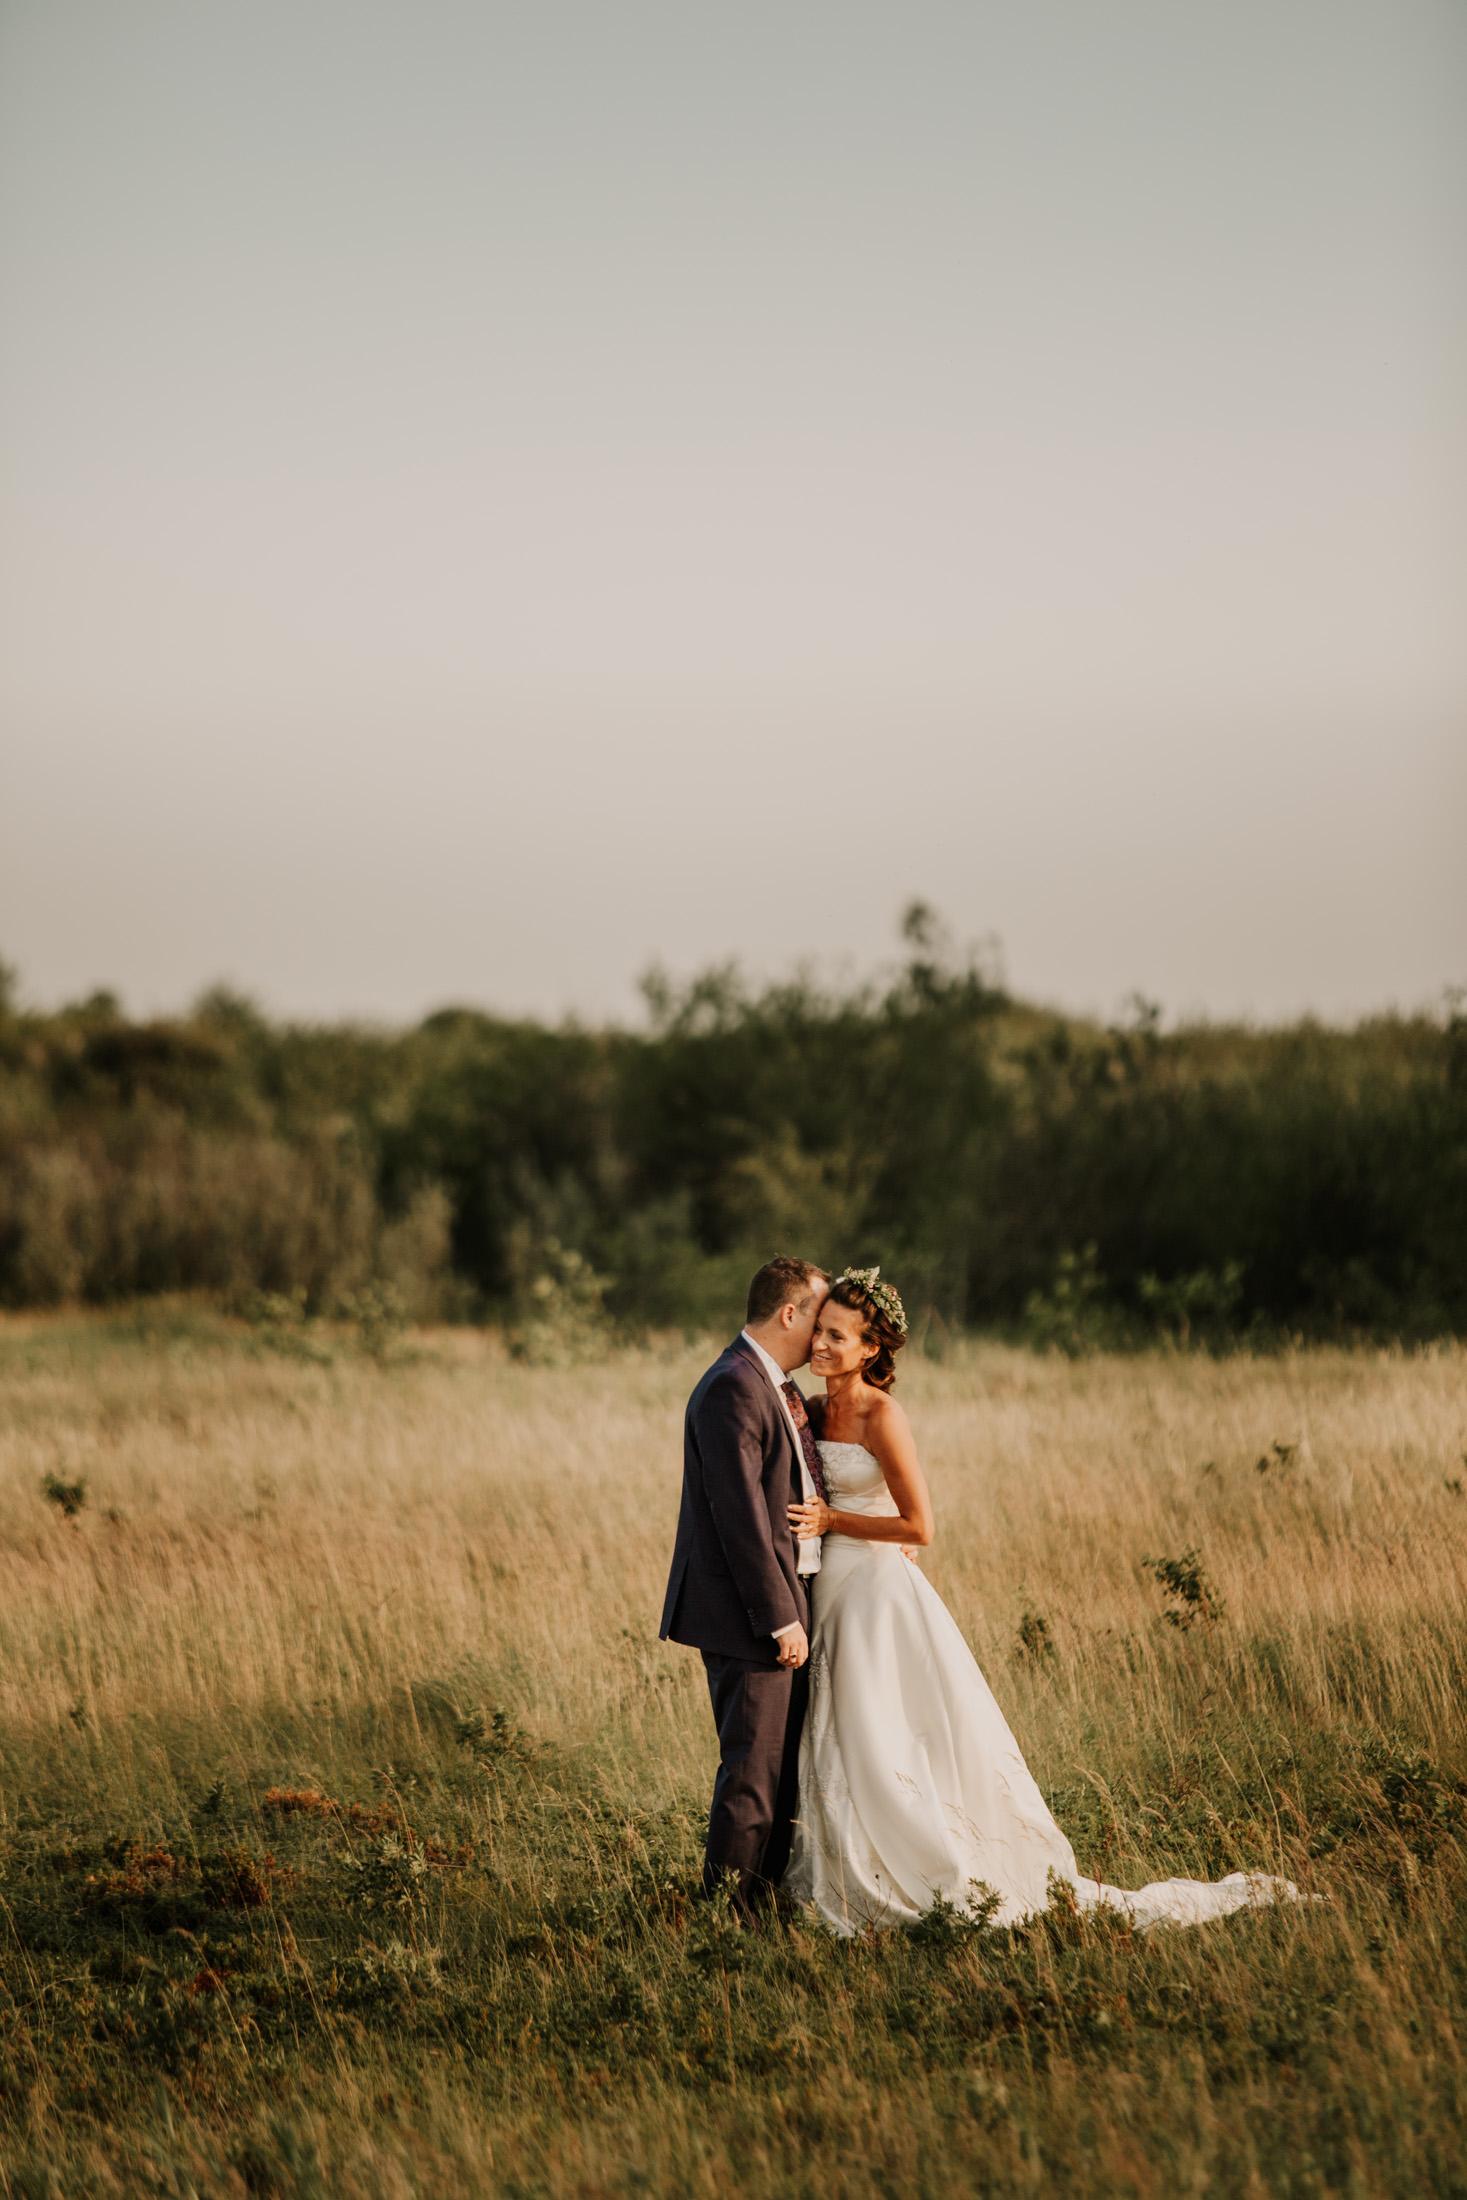 EnsoulEndearmentImagery-WeddingAnniversary-CranberryFlatsSaskatoon-SaskatoonWeddingphotographer-7414.jpg